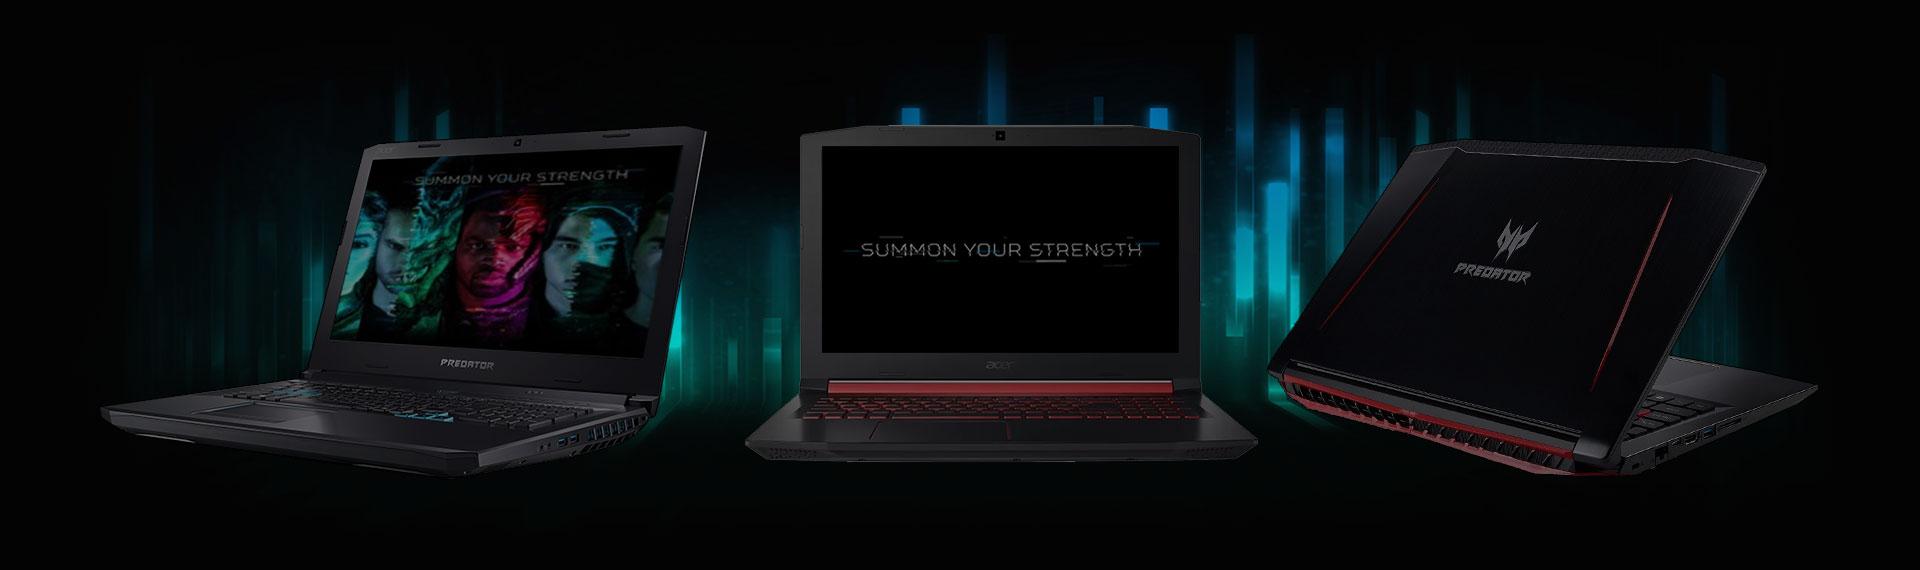 Acer yang Semakin Agresif Menyasar Pasar Gaming!